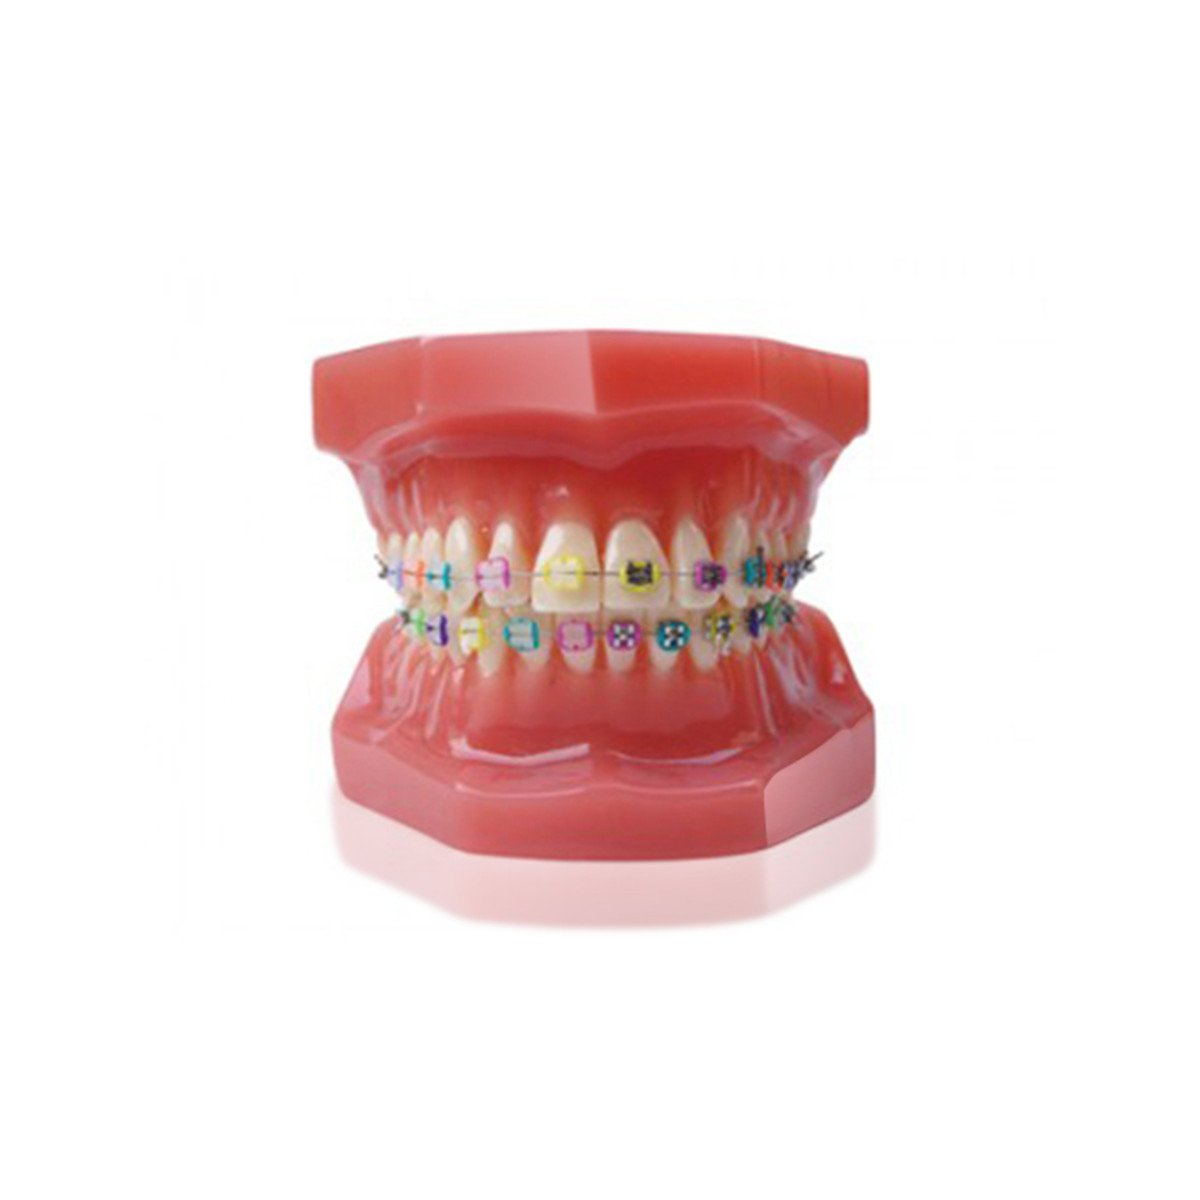 Teeth Model,Fencia Dental Orthodontic Teeth Study Model with Metal and Ceramic Brackets